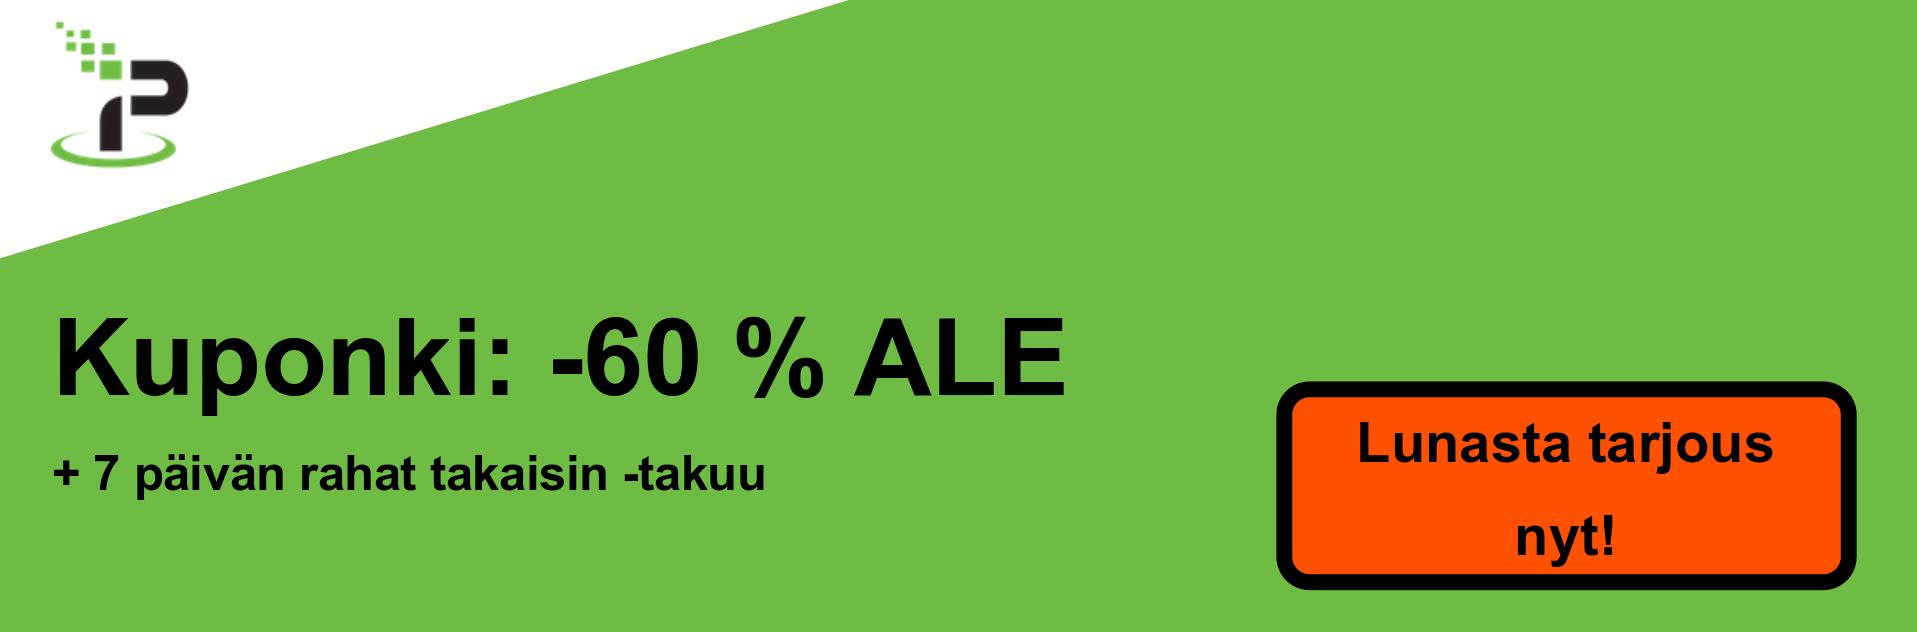 IPVanish-kuponki-banneri - 60% alennus